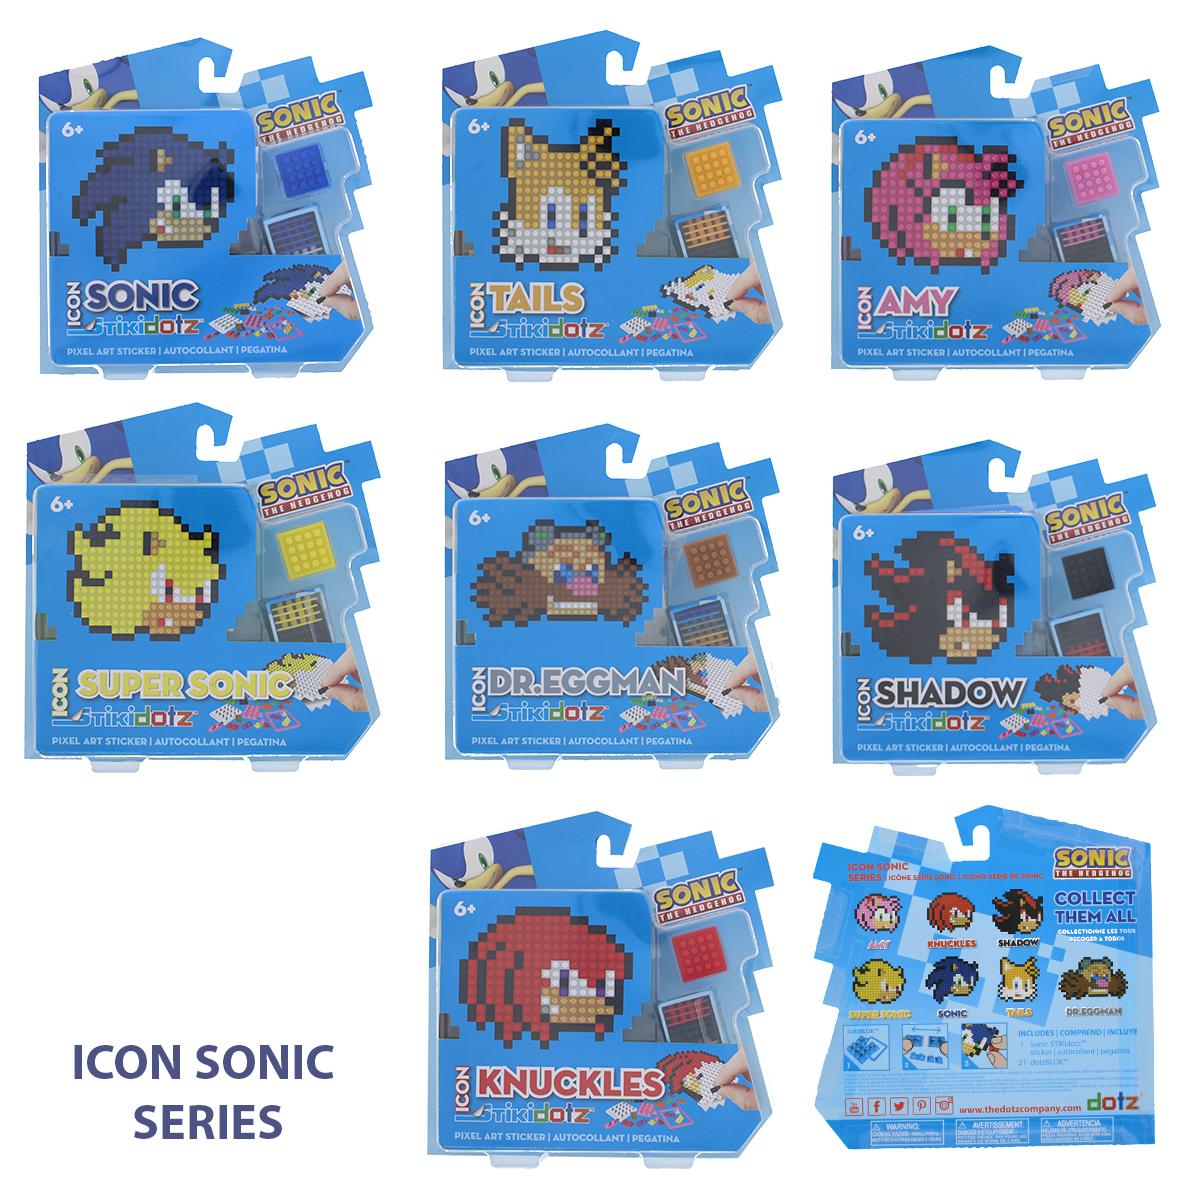 Icon Sonic all 1200x1200.jpg